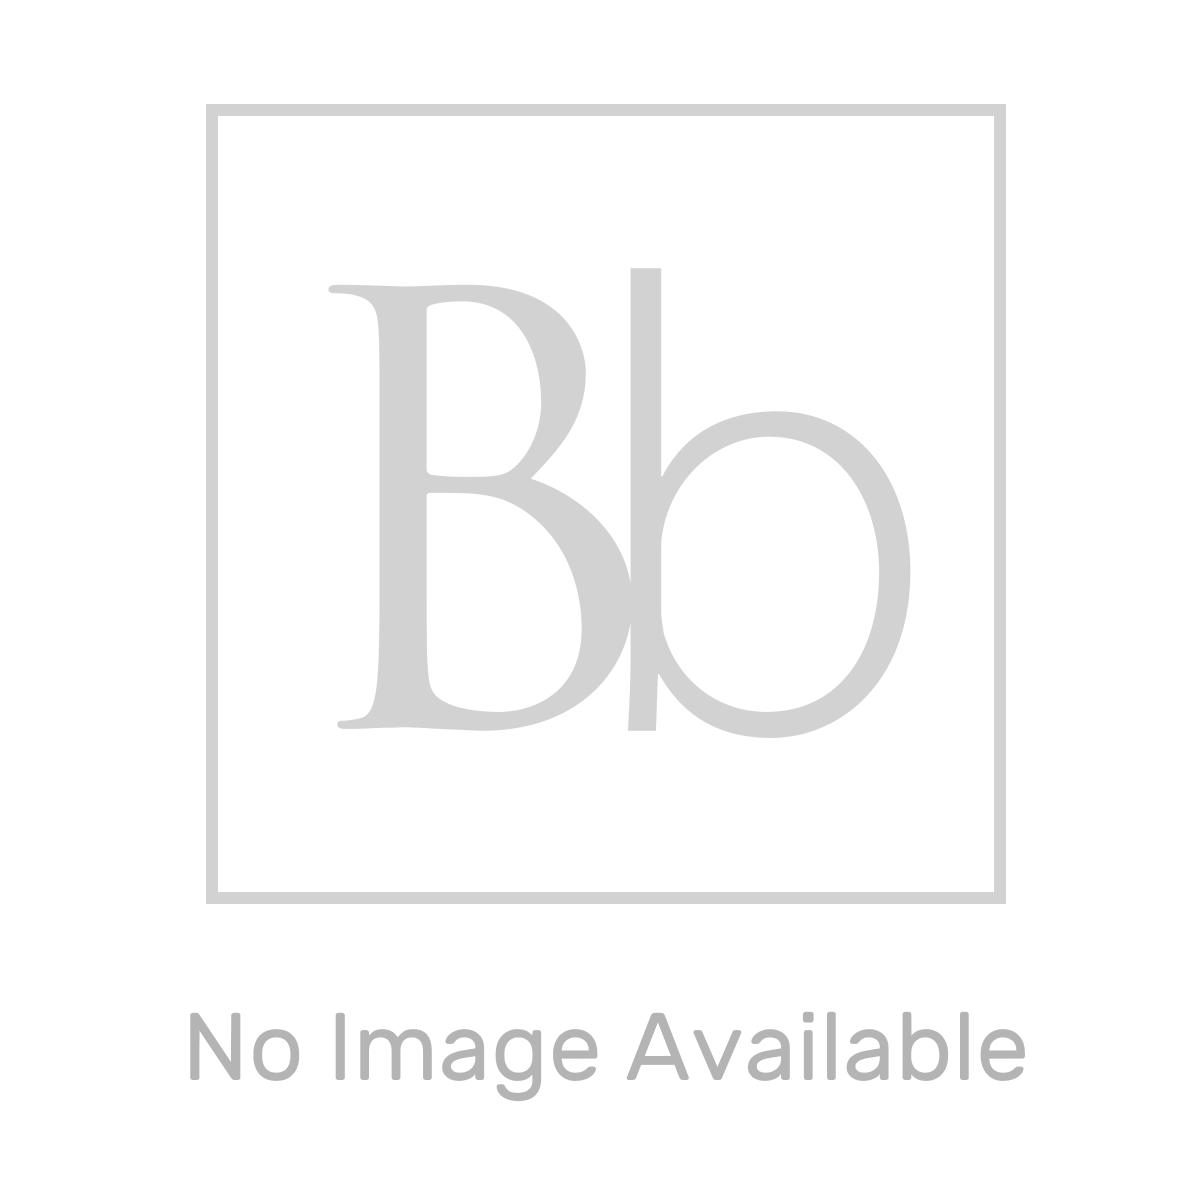 Hudson Reed Quartet White Gloss 3 Door Mirror Cabinet 1350mm line drawing